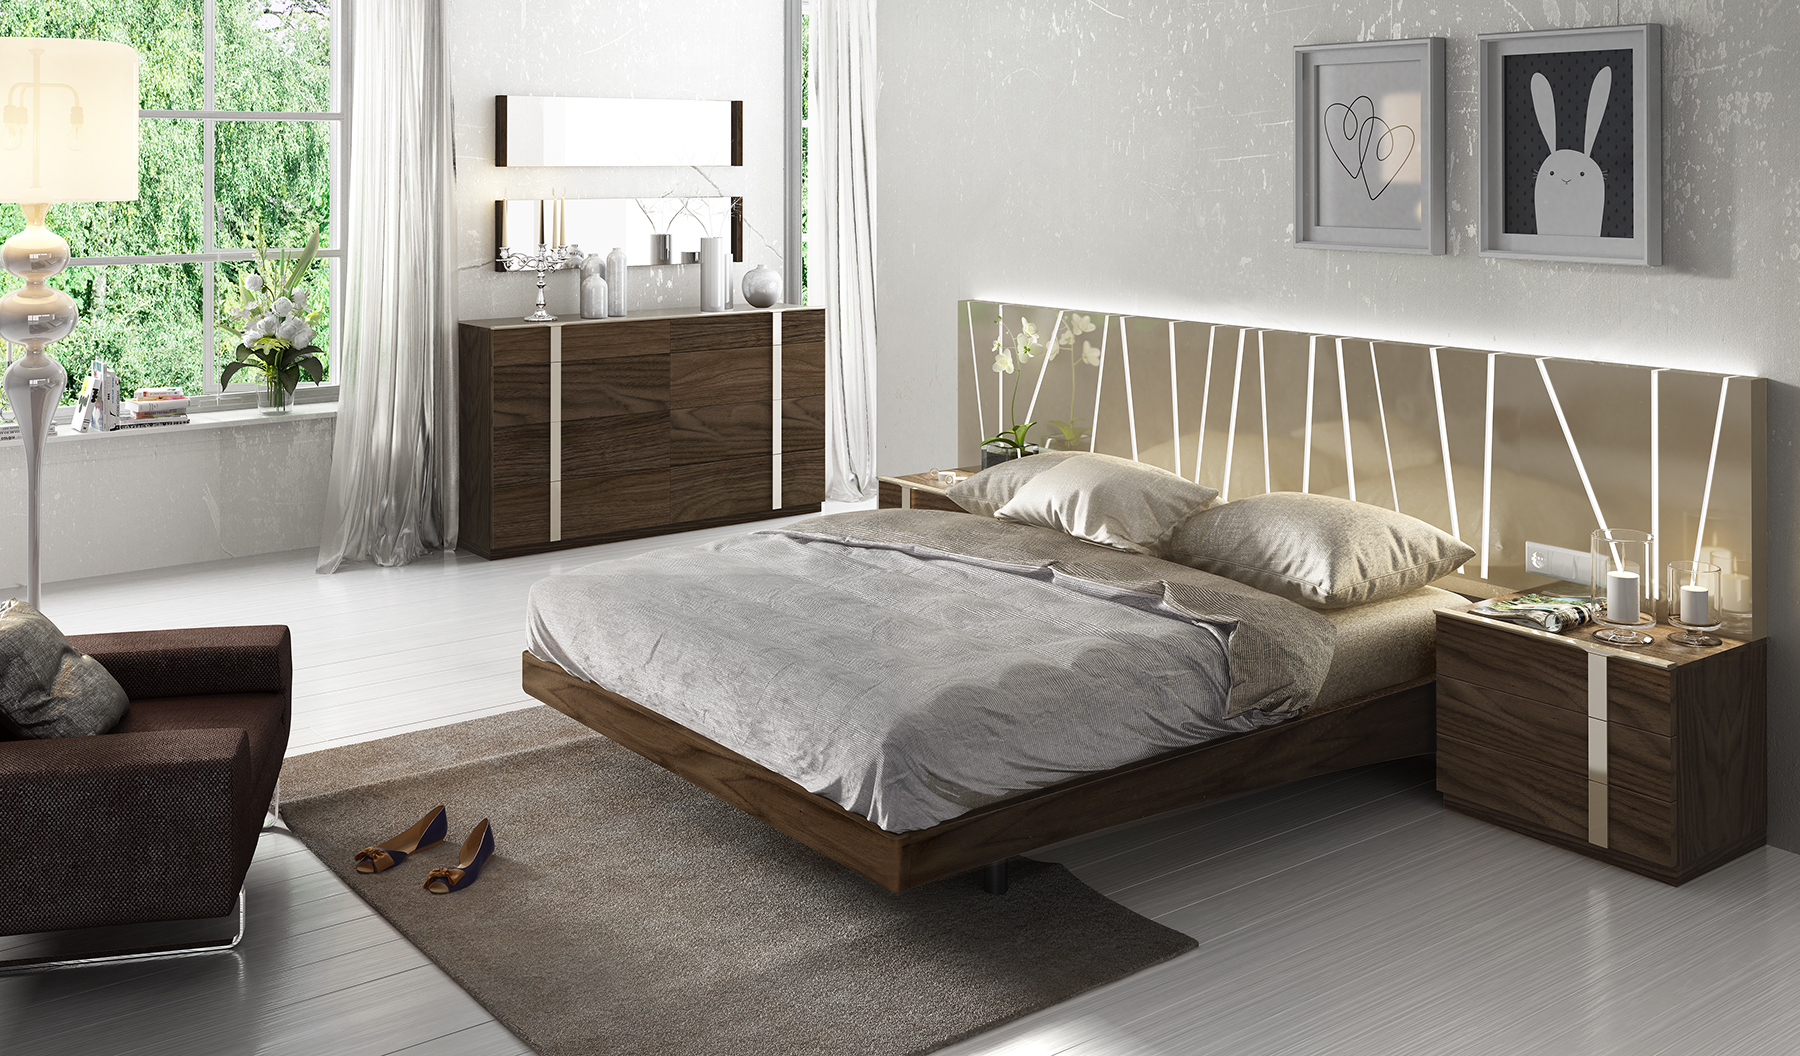 Fenicia Composition 4 / comp 606, Fenicia Modern Bedroom Sets, Spain ...